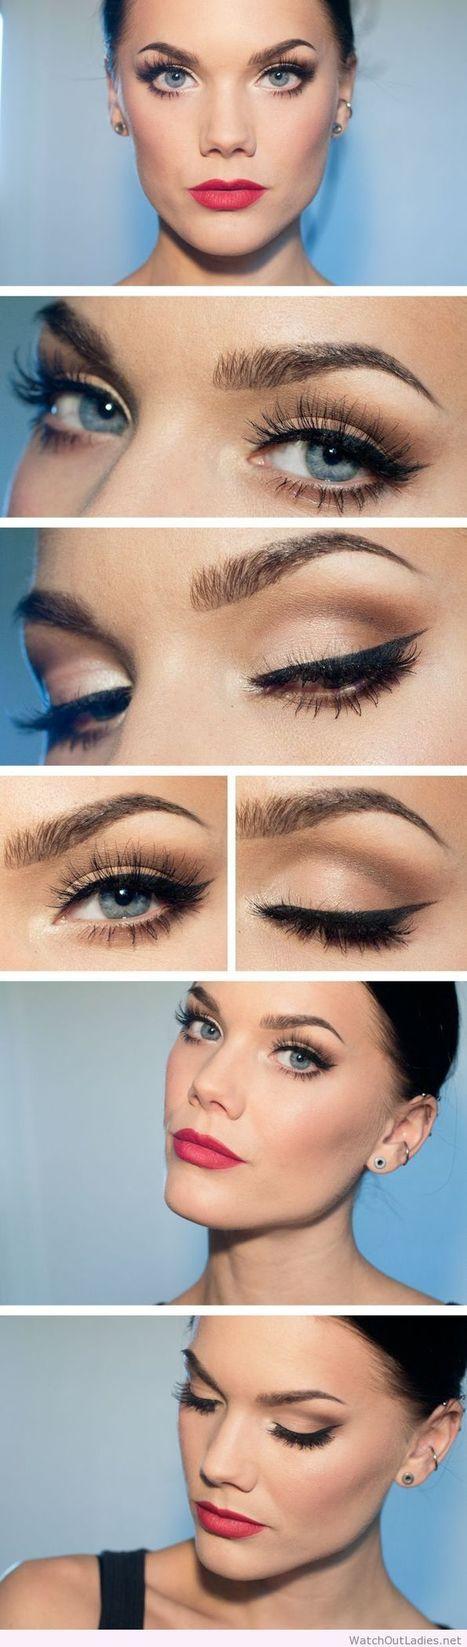 Linda Hallberg lady makeup, nude eye makeup and